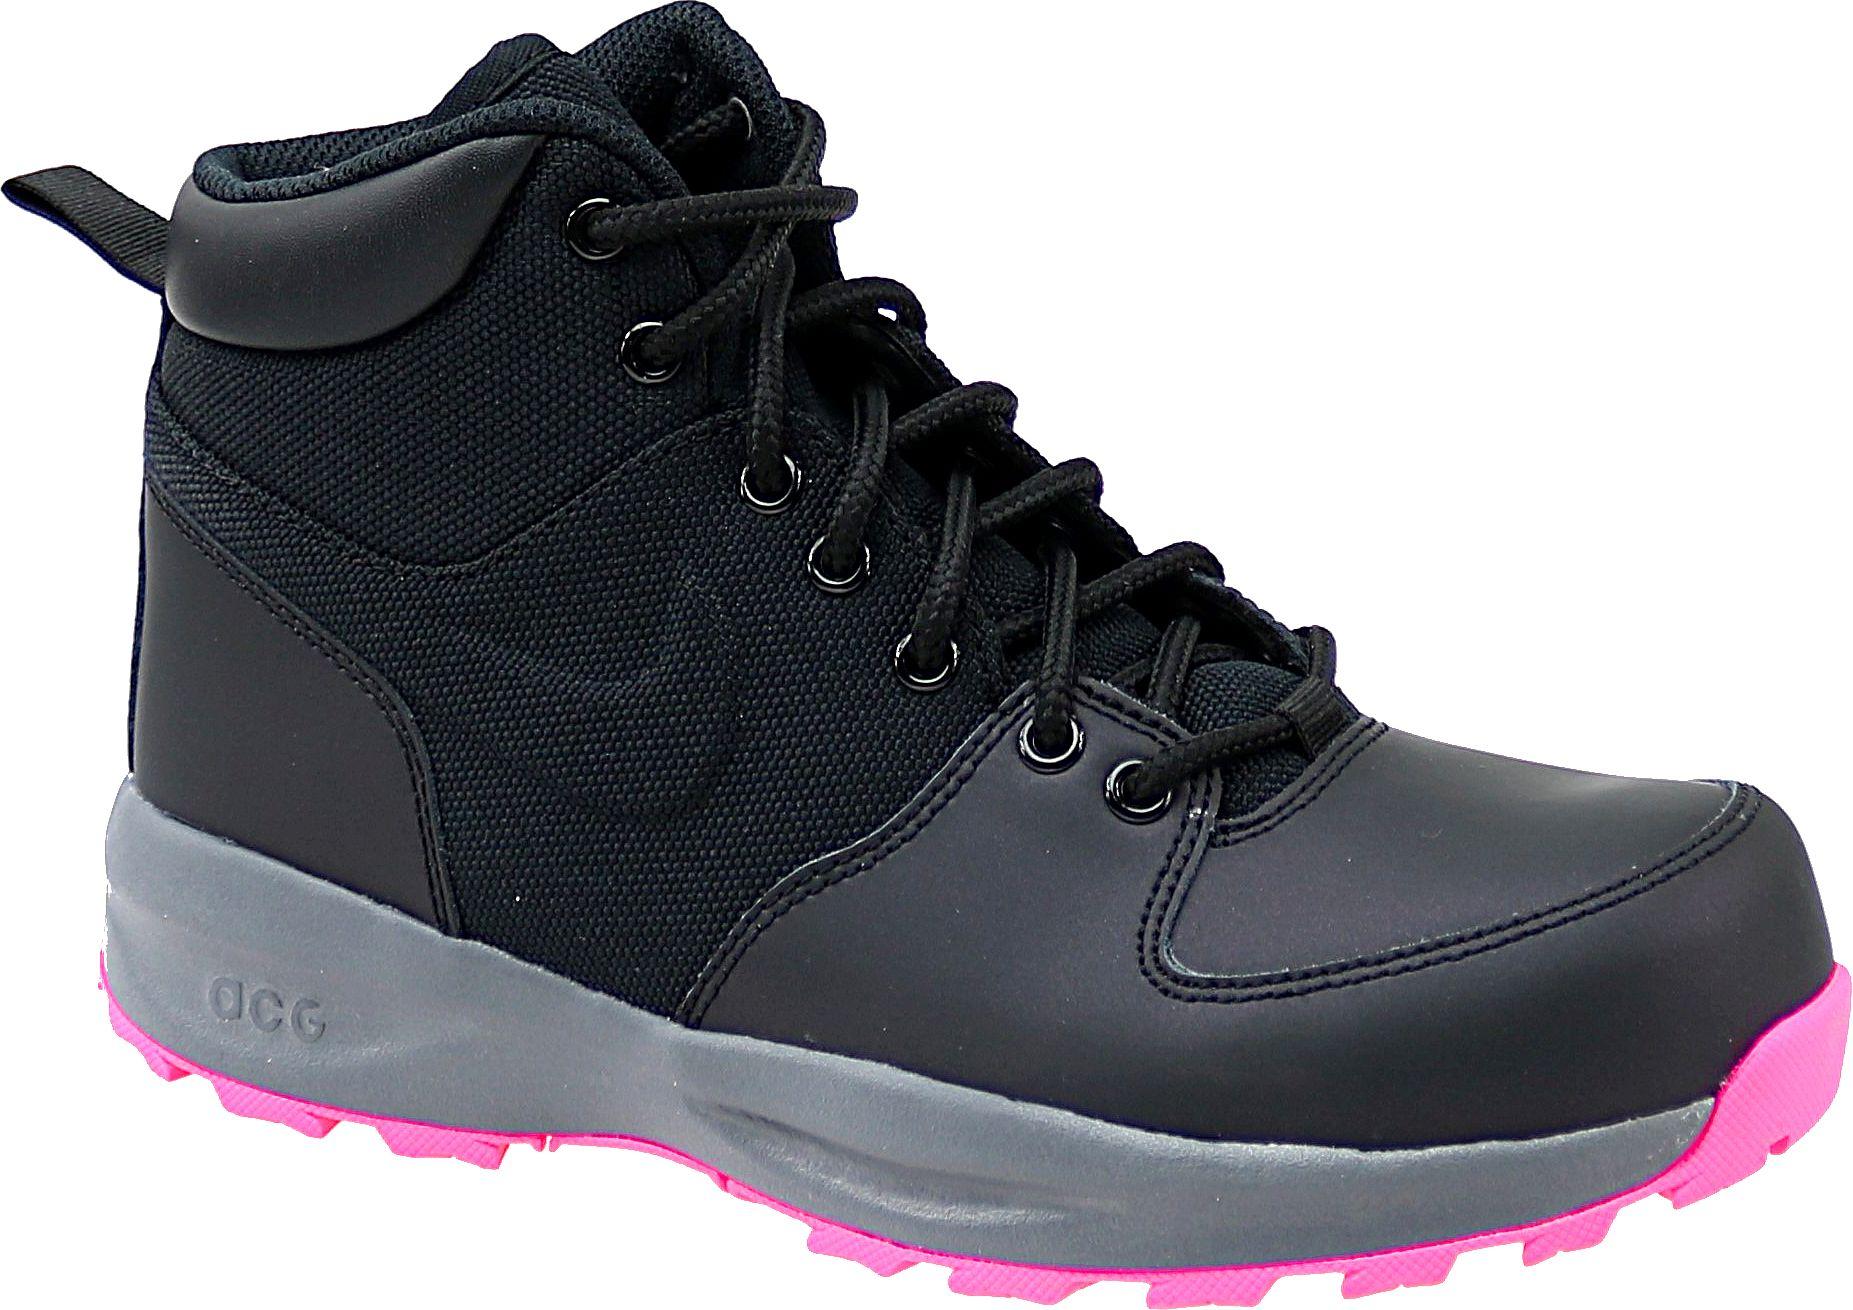 Nike Buty dziewczece Manoa Lth GS czarne r. 36.5 (859412-006) 859412-006